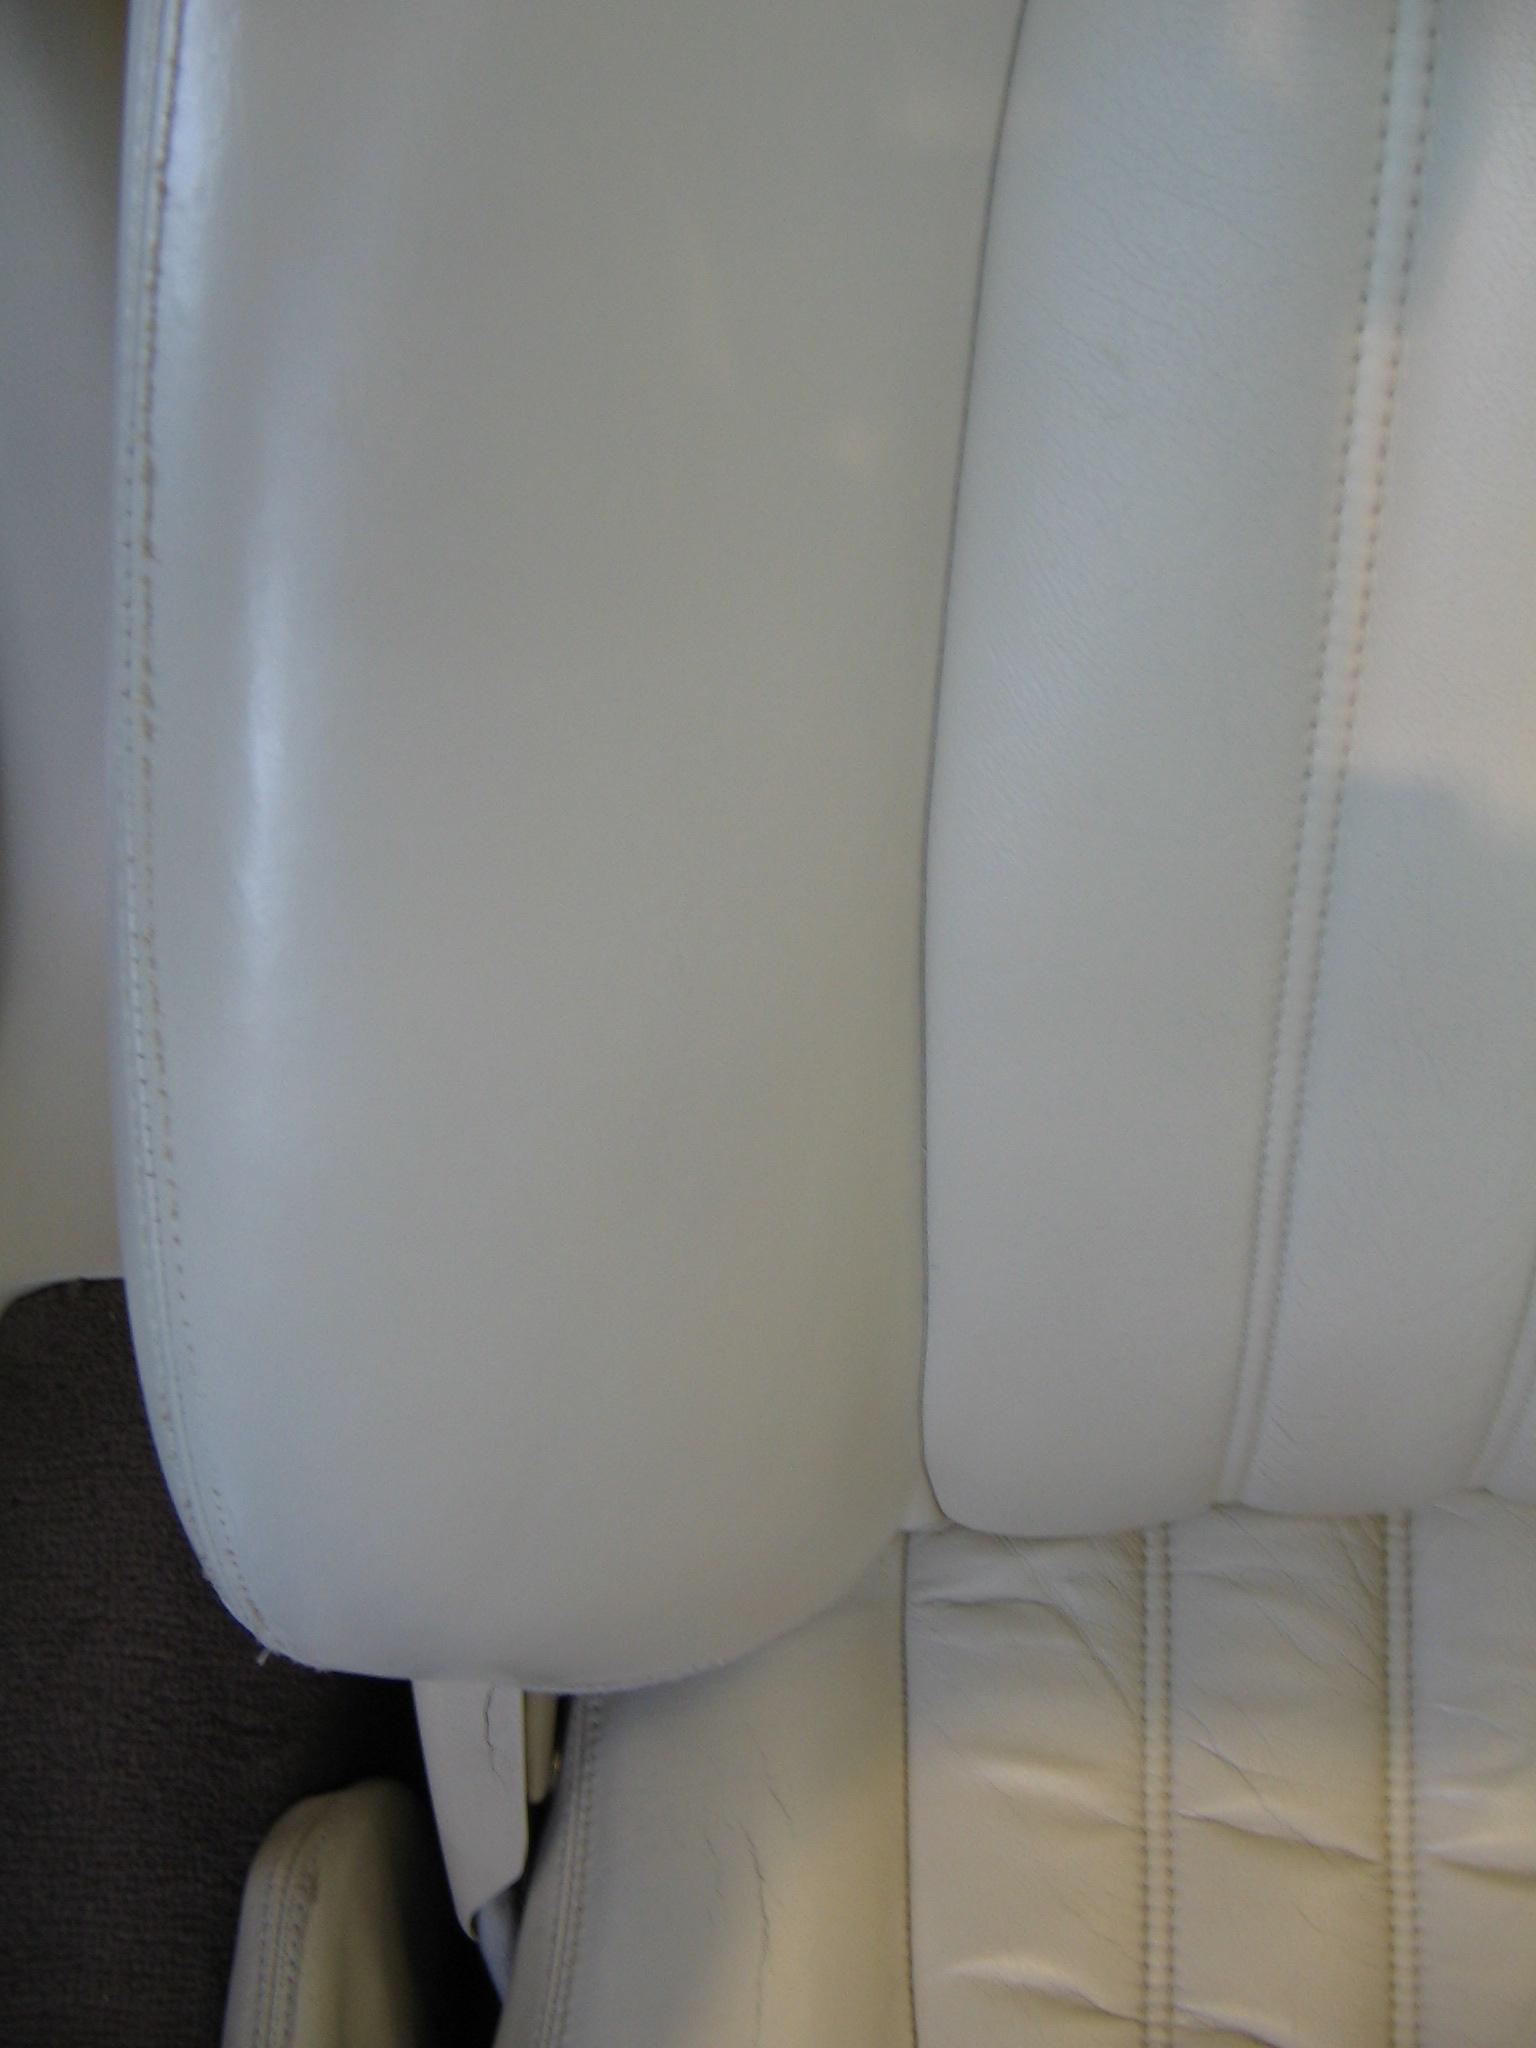 Worn Driver's Seat